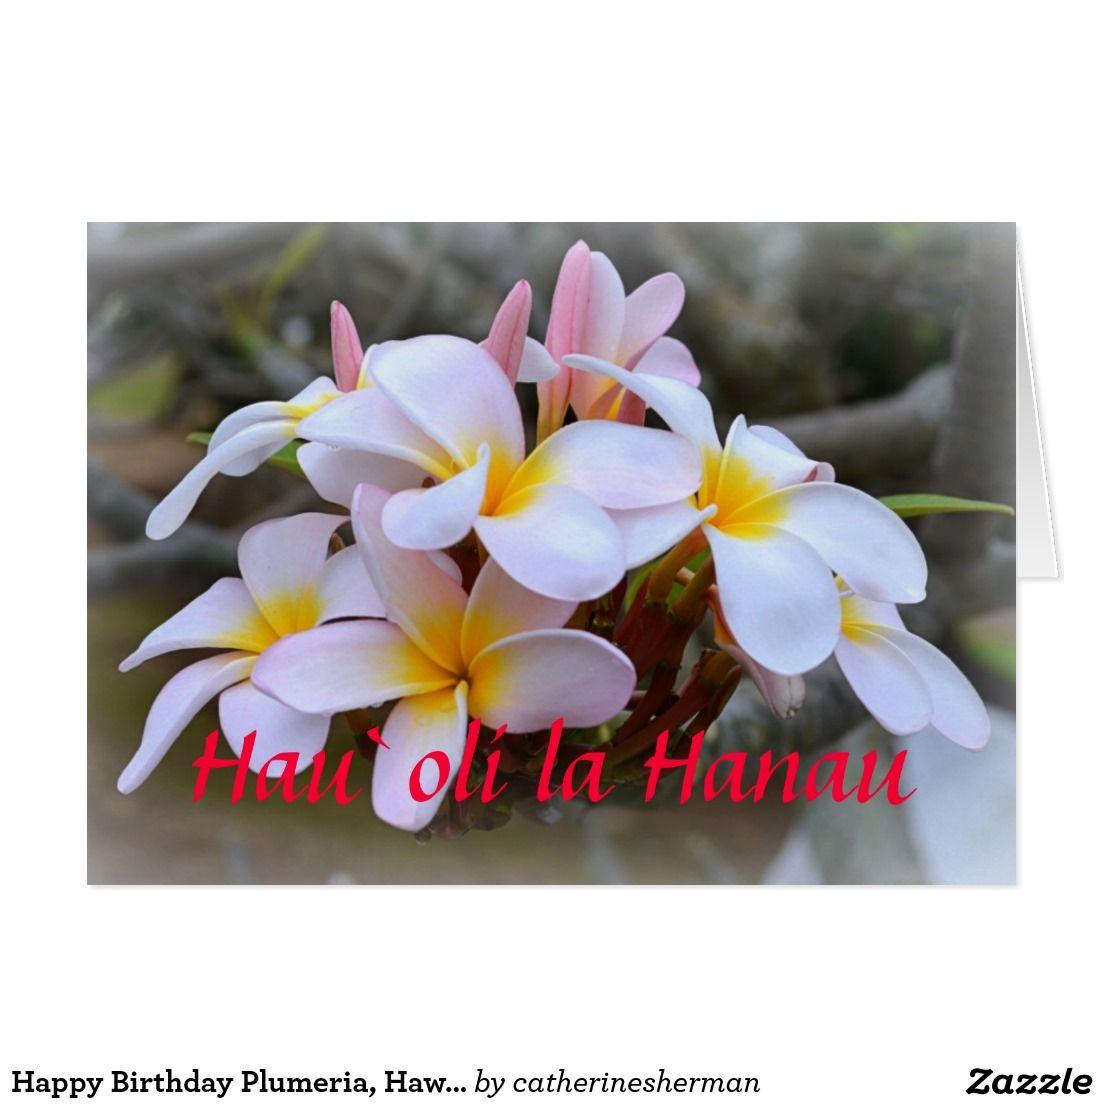 Happy Birthday Plumeria Hawaiian Card Stuff Sold On Zazzle